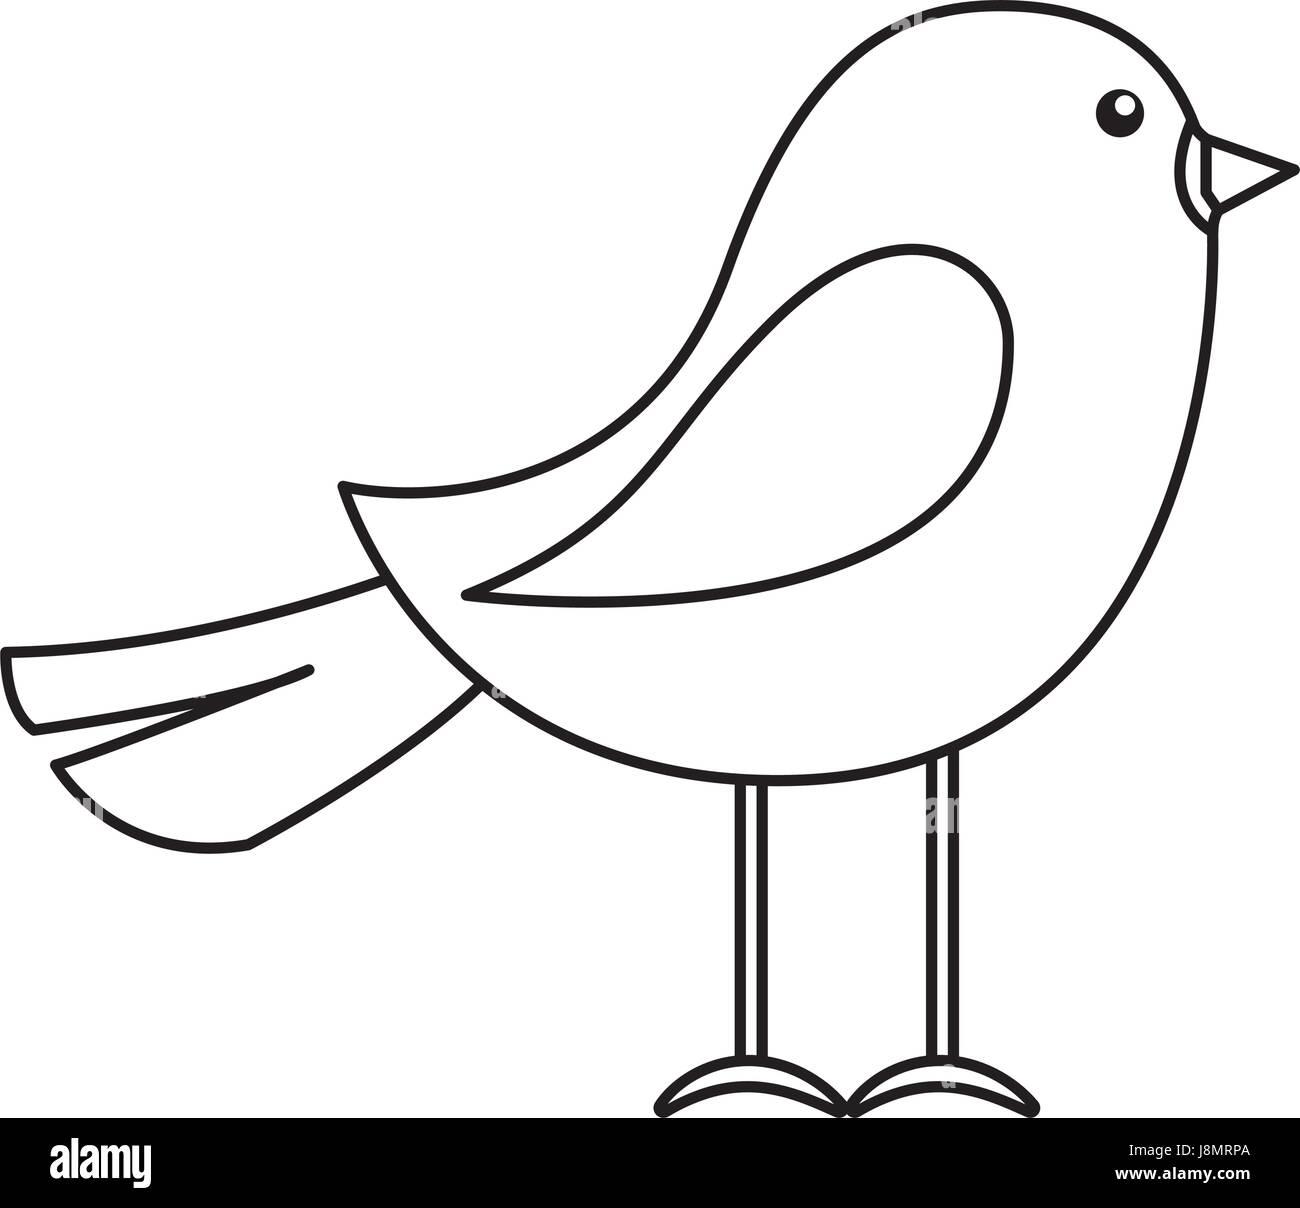 Flying bird cartoon black and white - photo#48